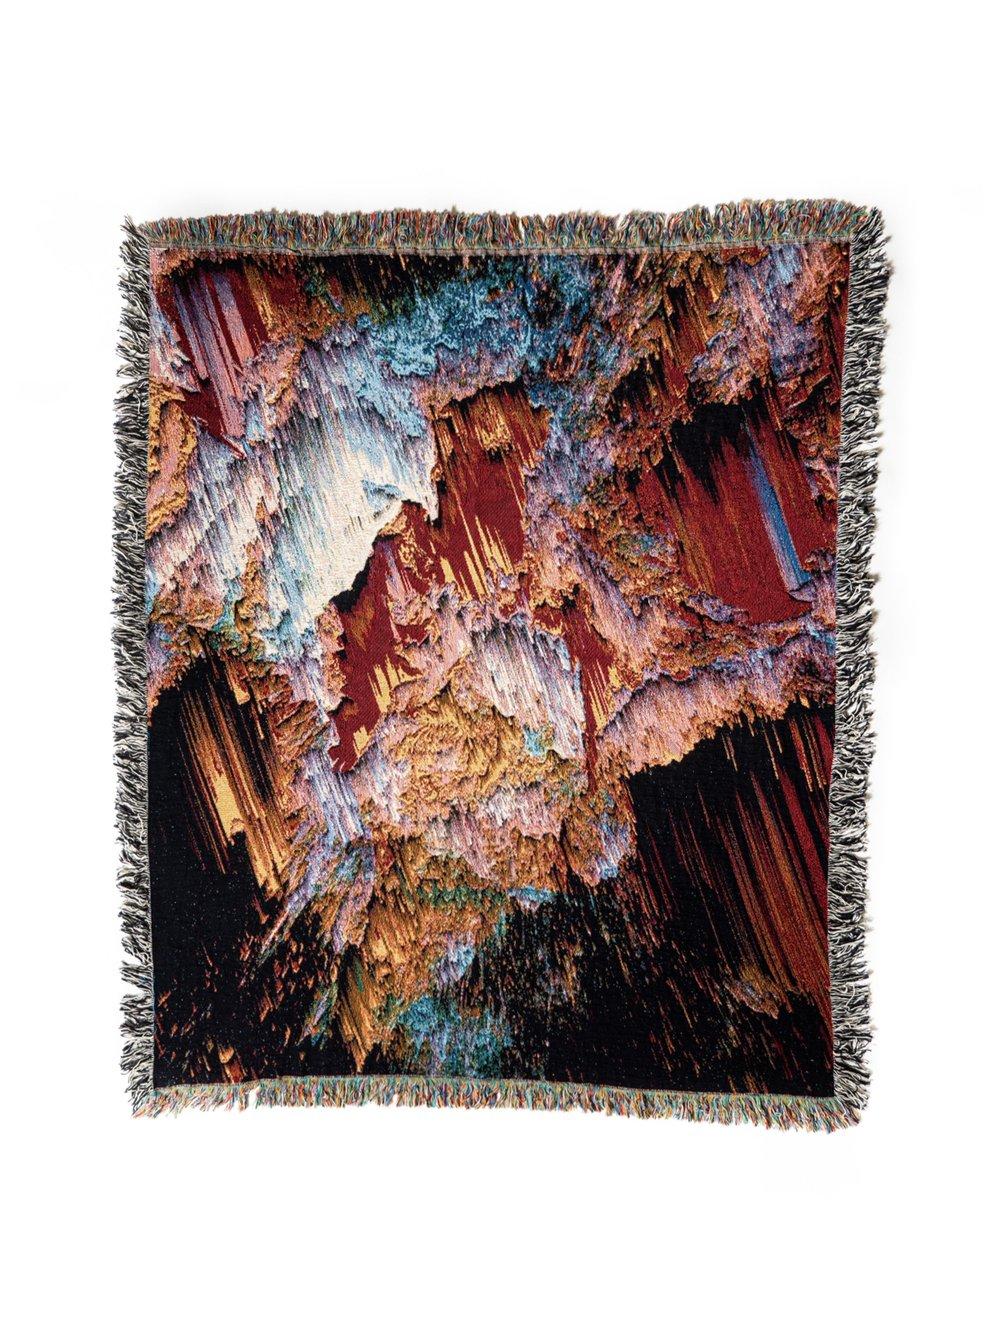 Woven Blanket #30